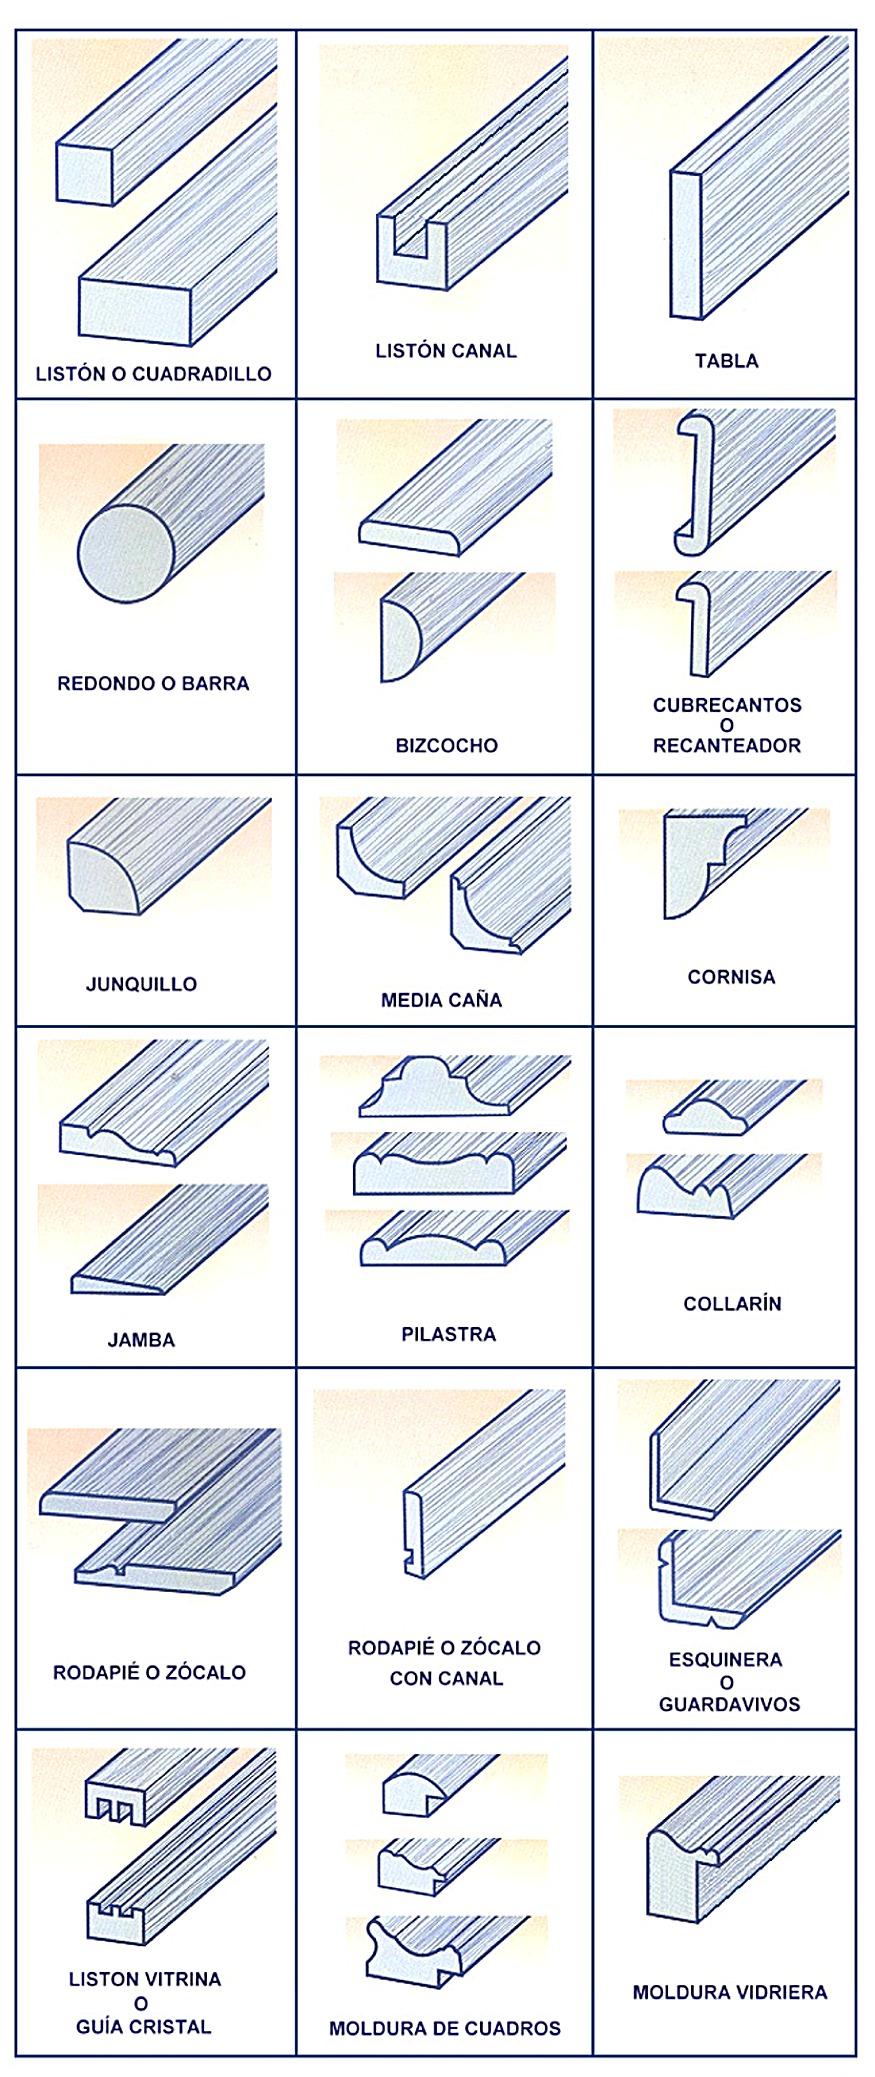 Tipos de molduras - Tipos de molduras ...